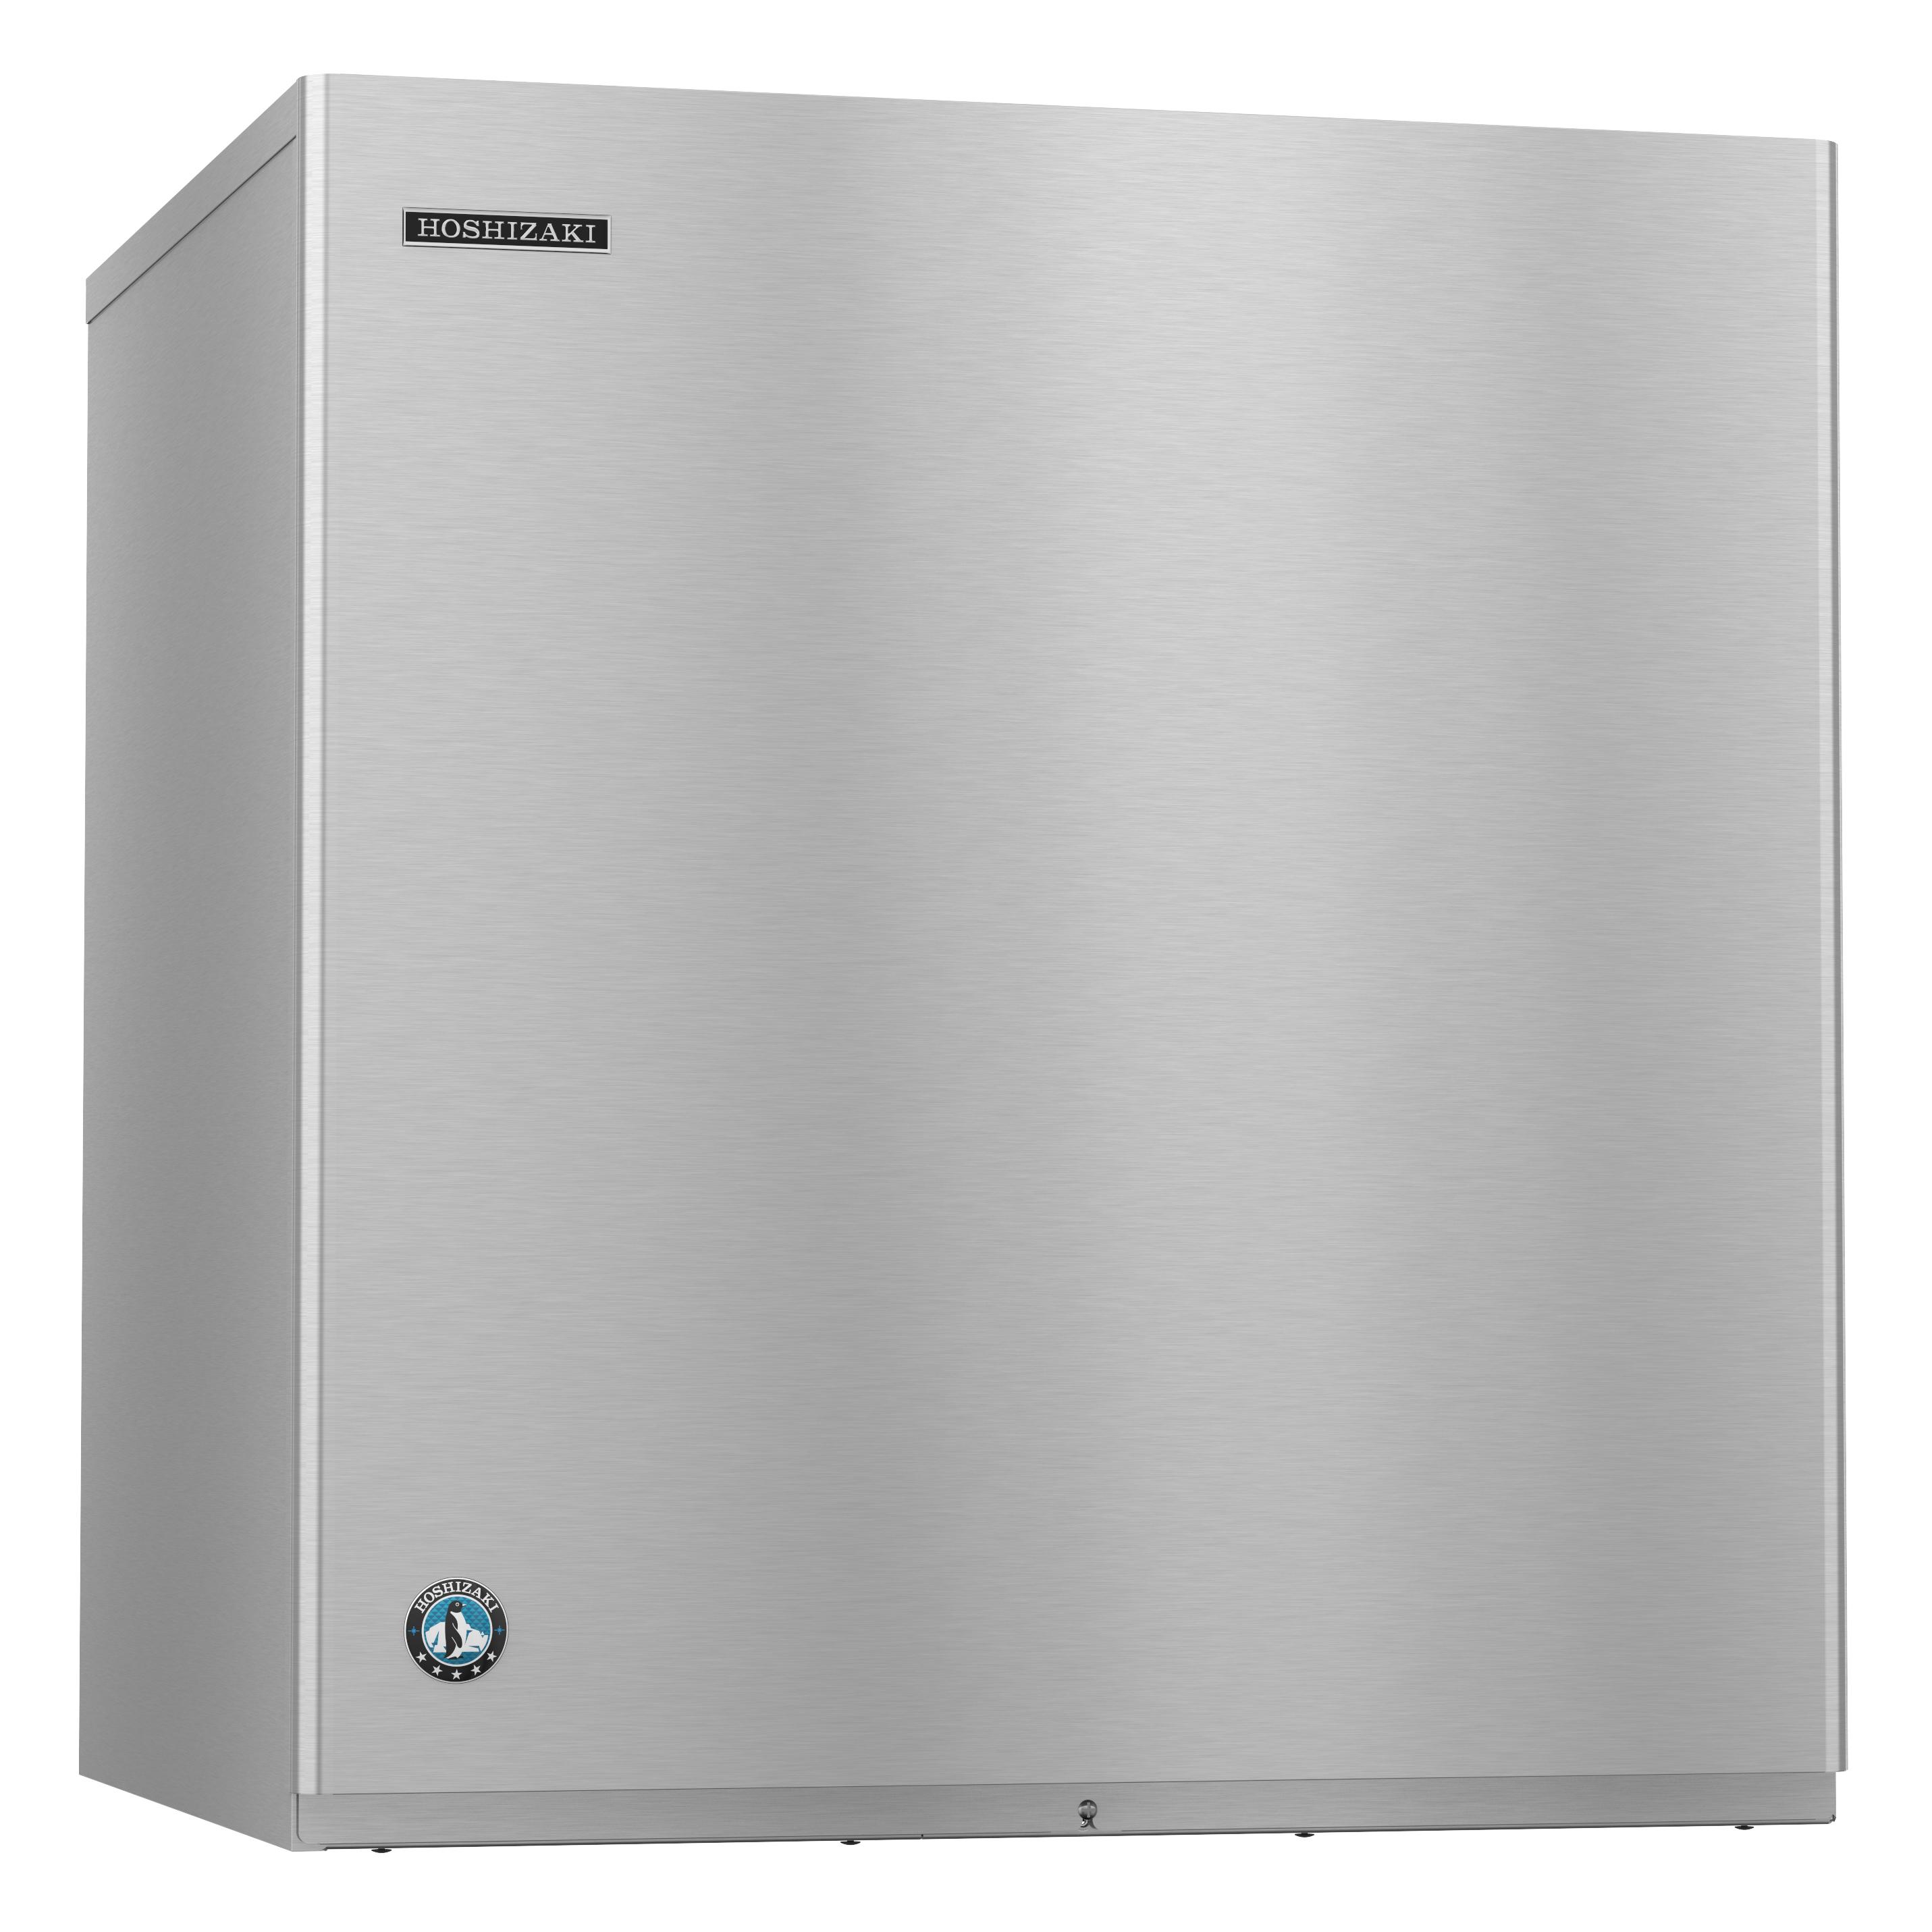 Hoshizaki KM-1100MRJ ice cubers, ice storage & ice dispensers